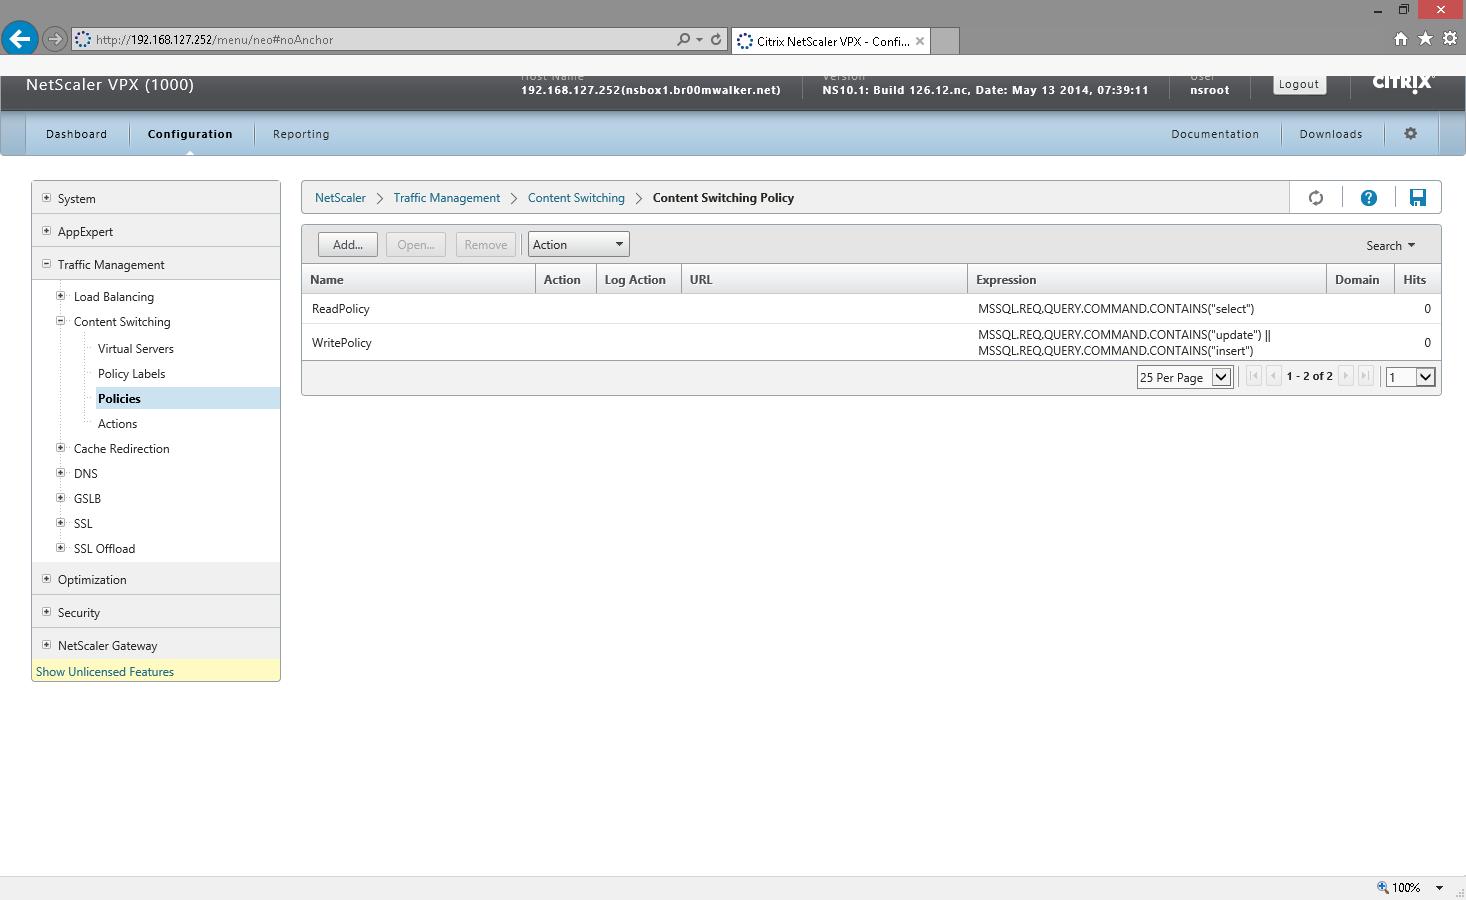 Load Balancing Microsoft SQL Server 2012 AlwaysON Databases